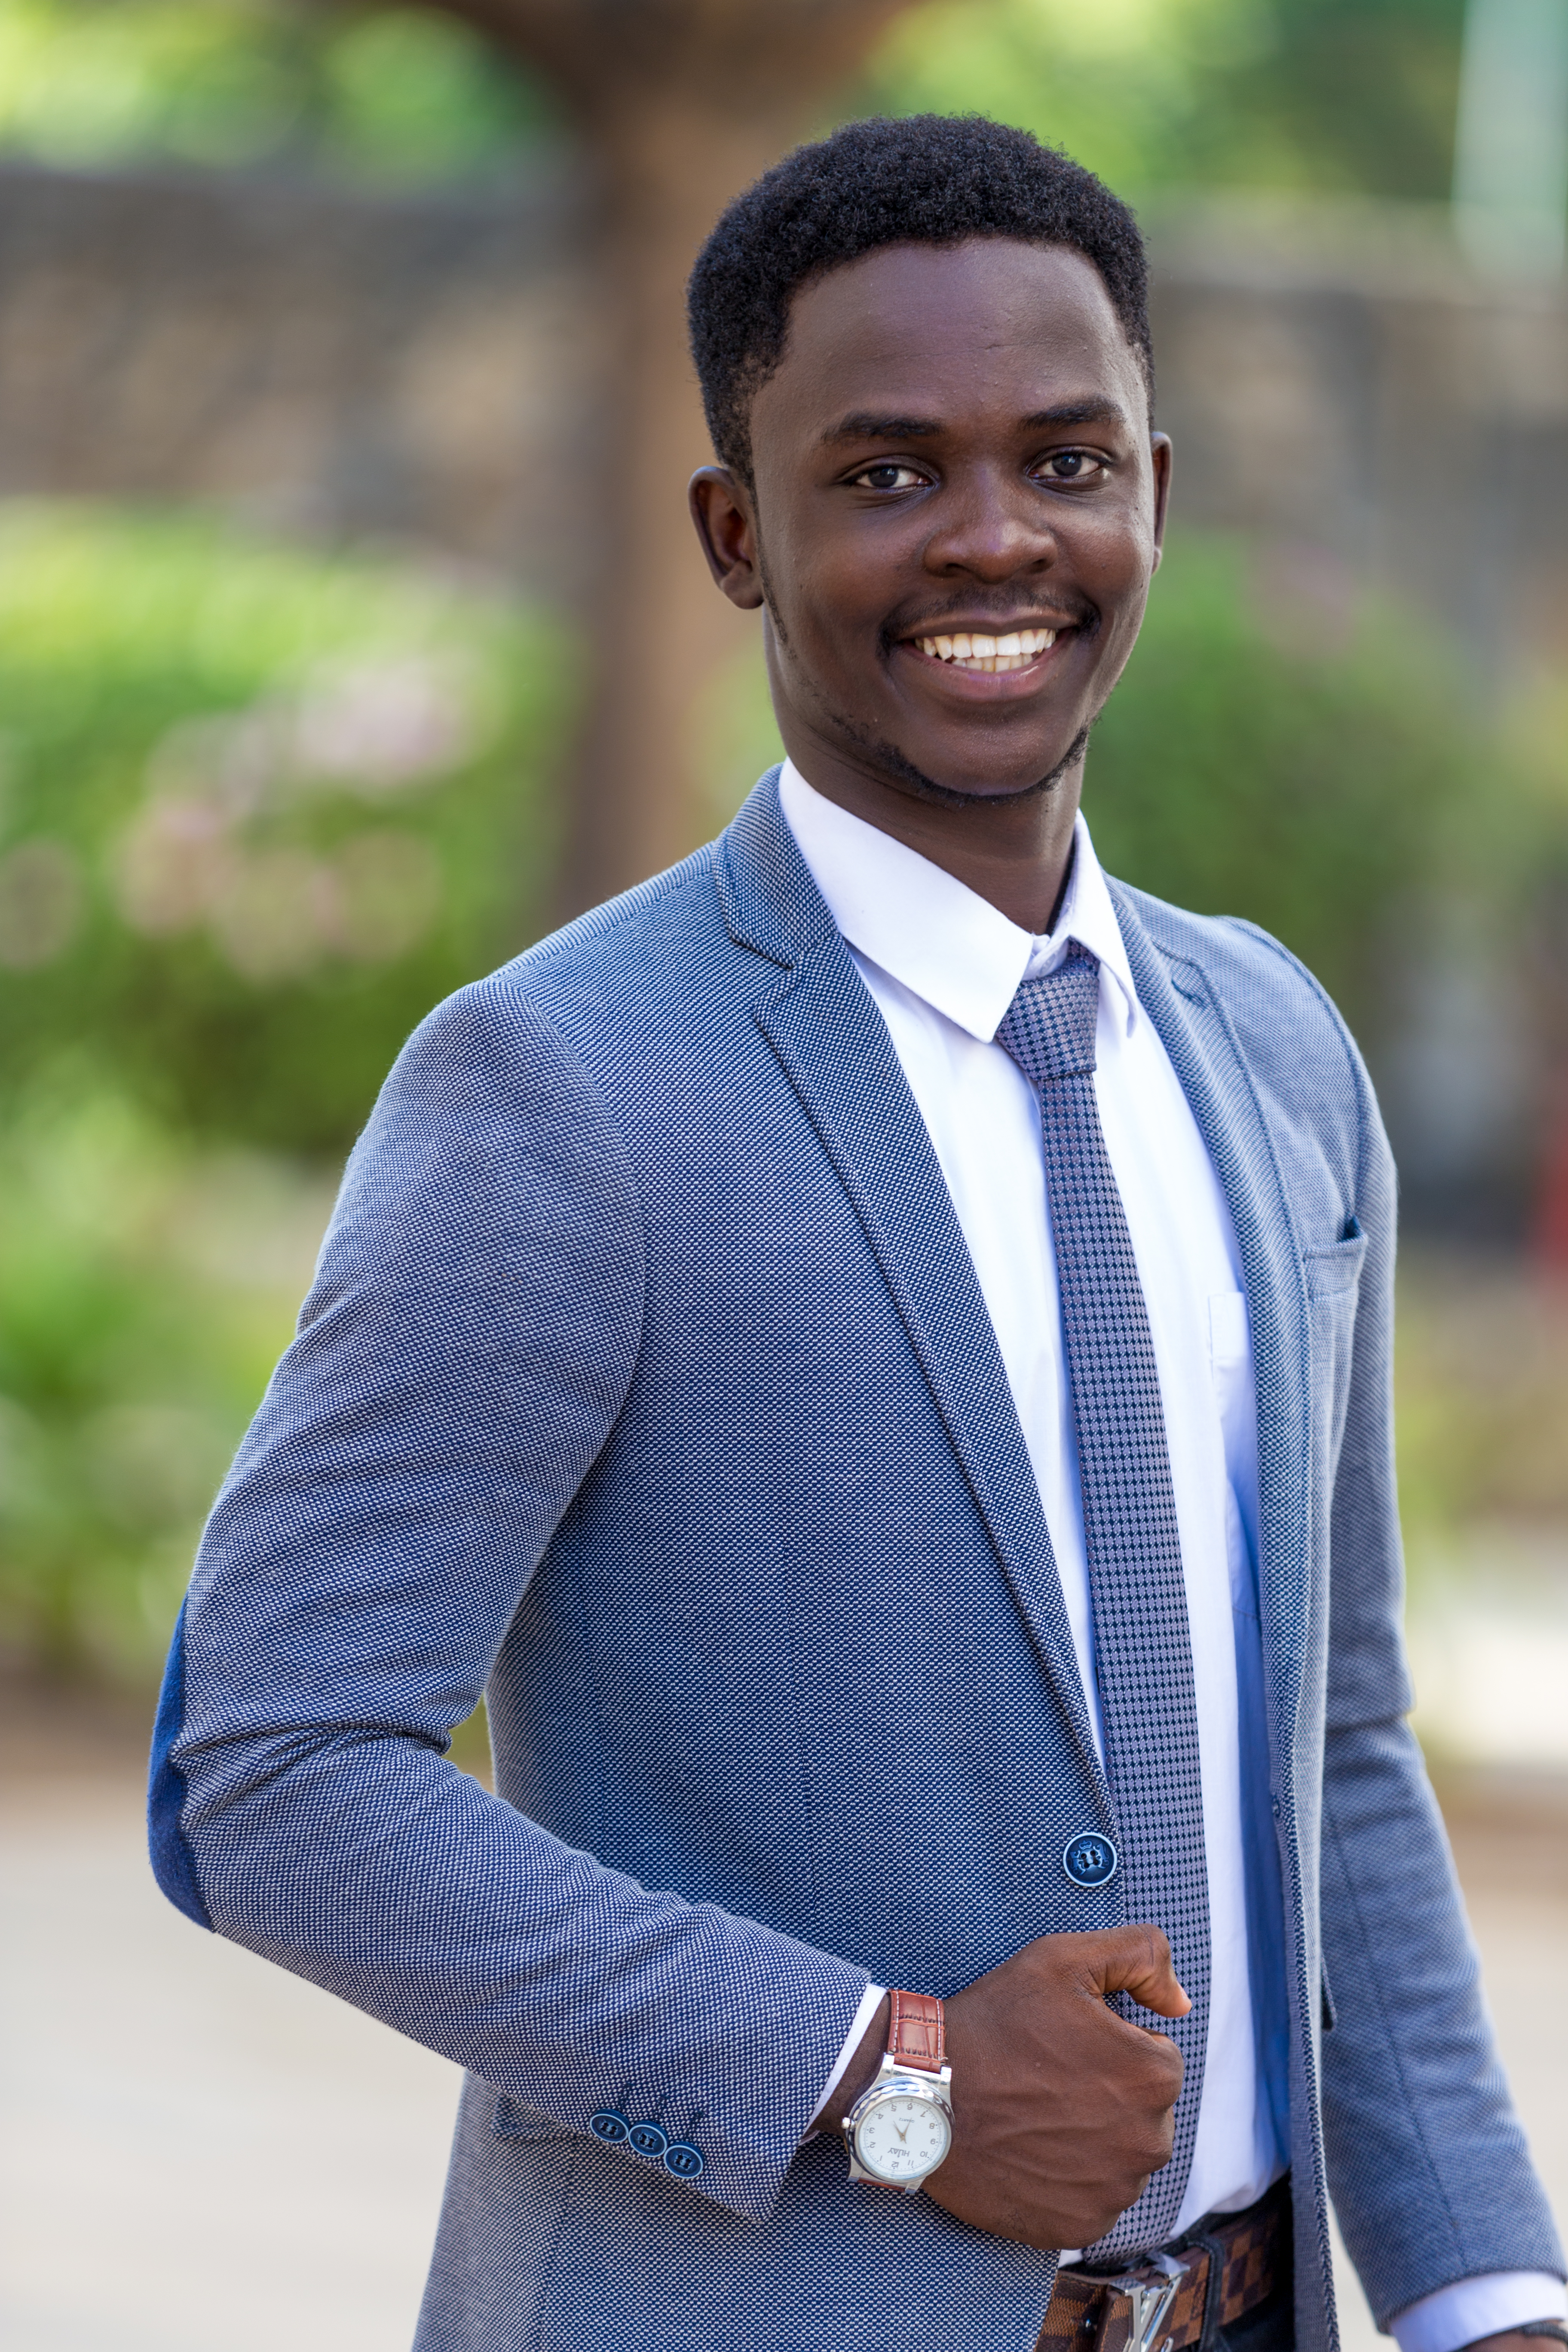 Edgar Wangira